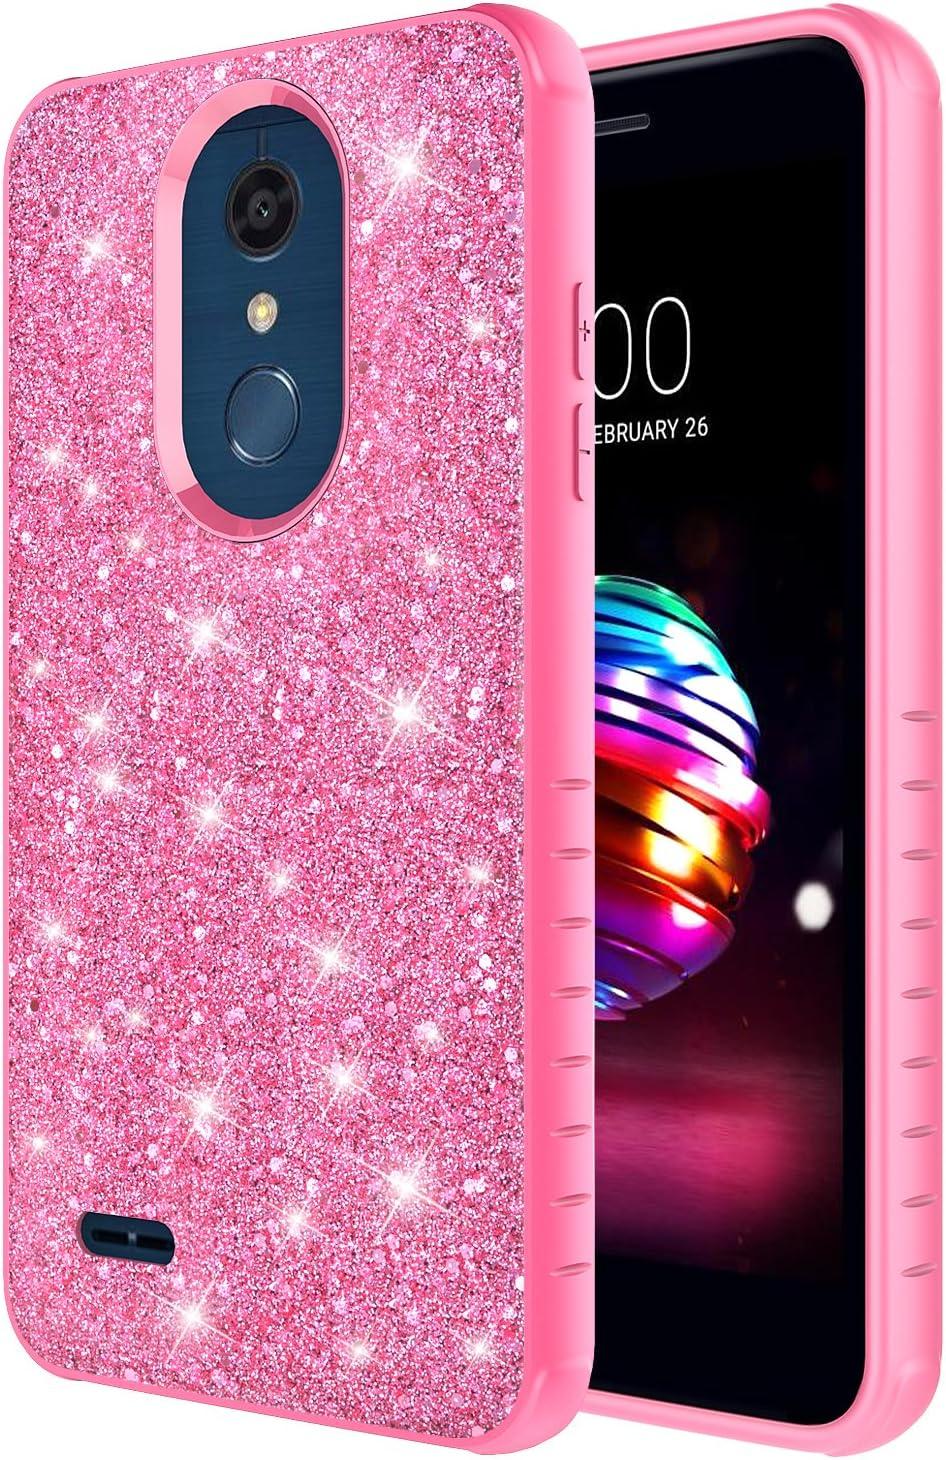 Rosebono for LG Premier Pro LTE Case, LG K30 Case, LG K10 2018 Case, Cute Fashinon Hybird Luxury Shinning Bling Classy Glitter Sparkle Protective Shockproof Case Cover for LG K30 (Pink/Pink)